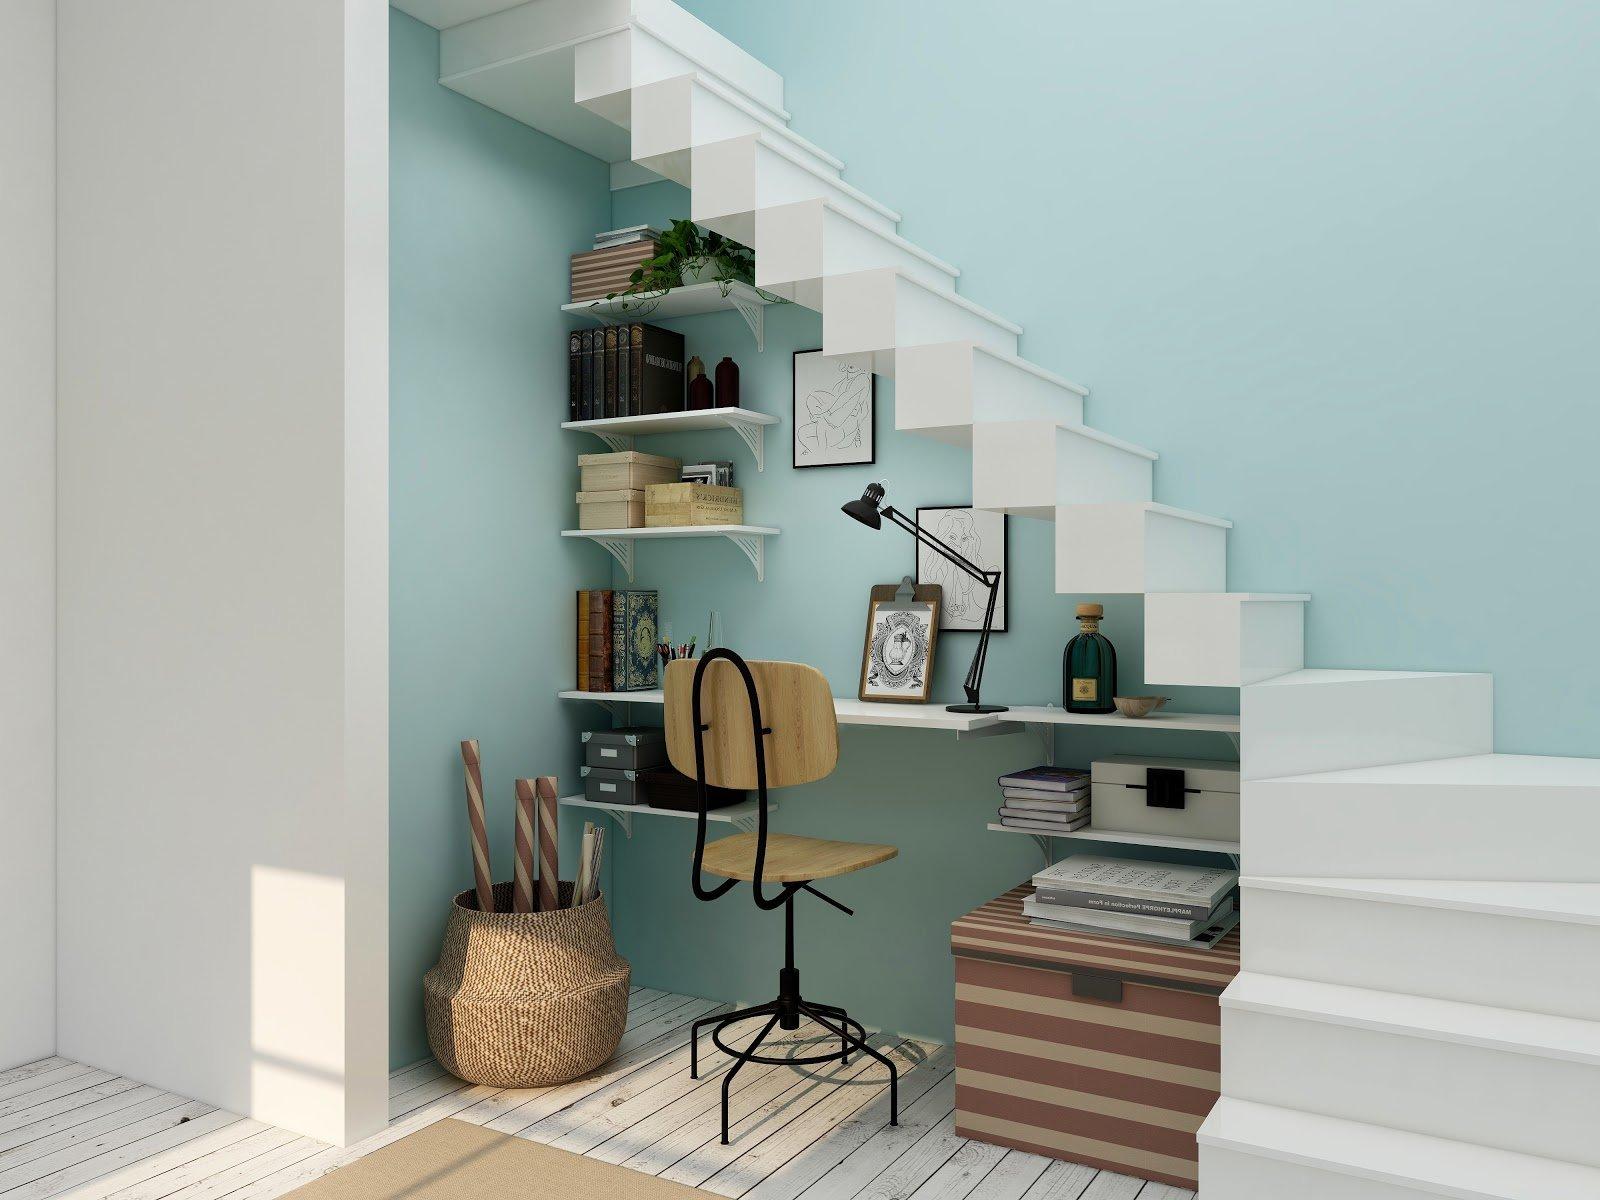 How to Make Under Stairs Storage